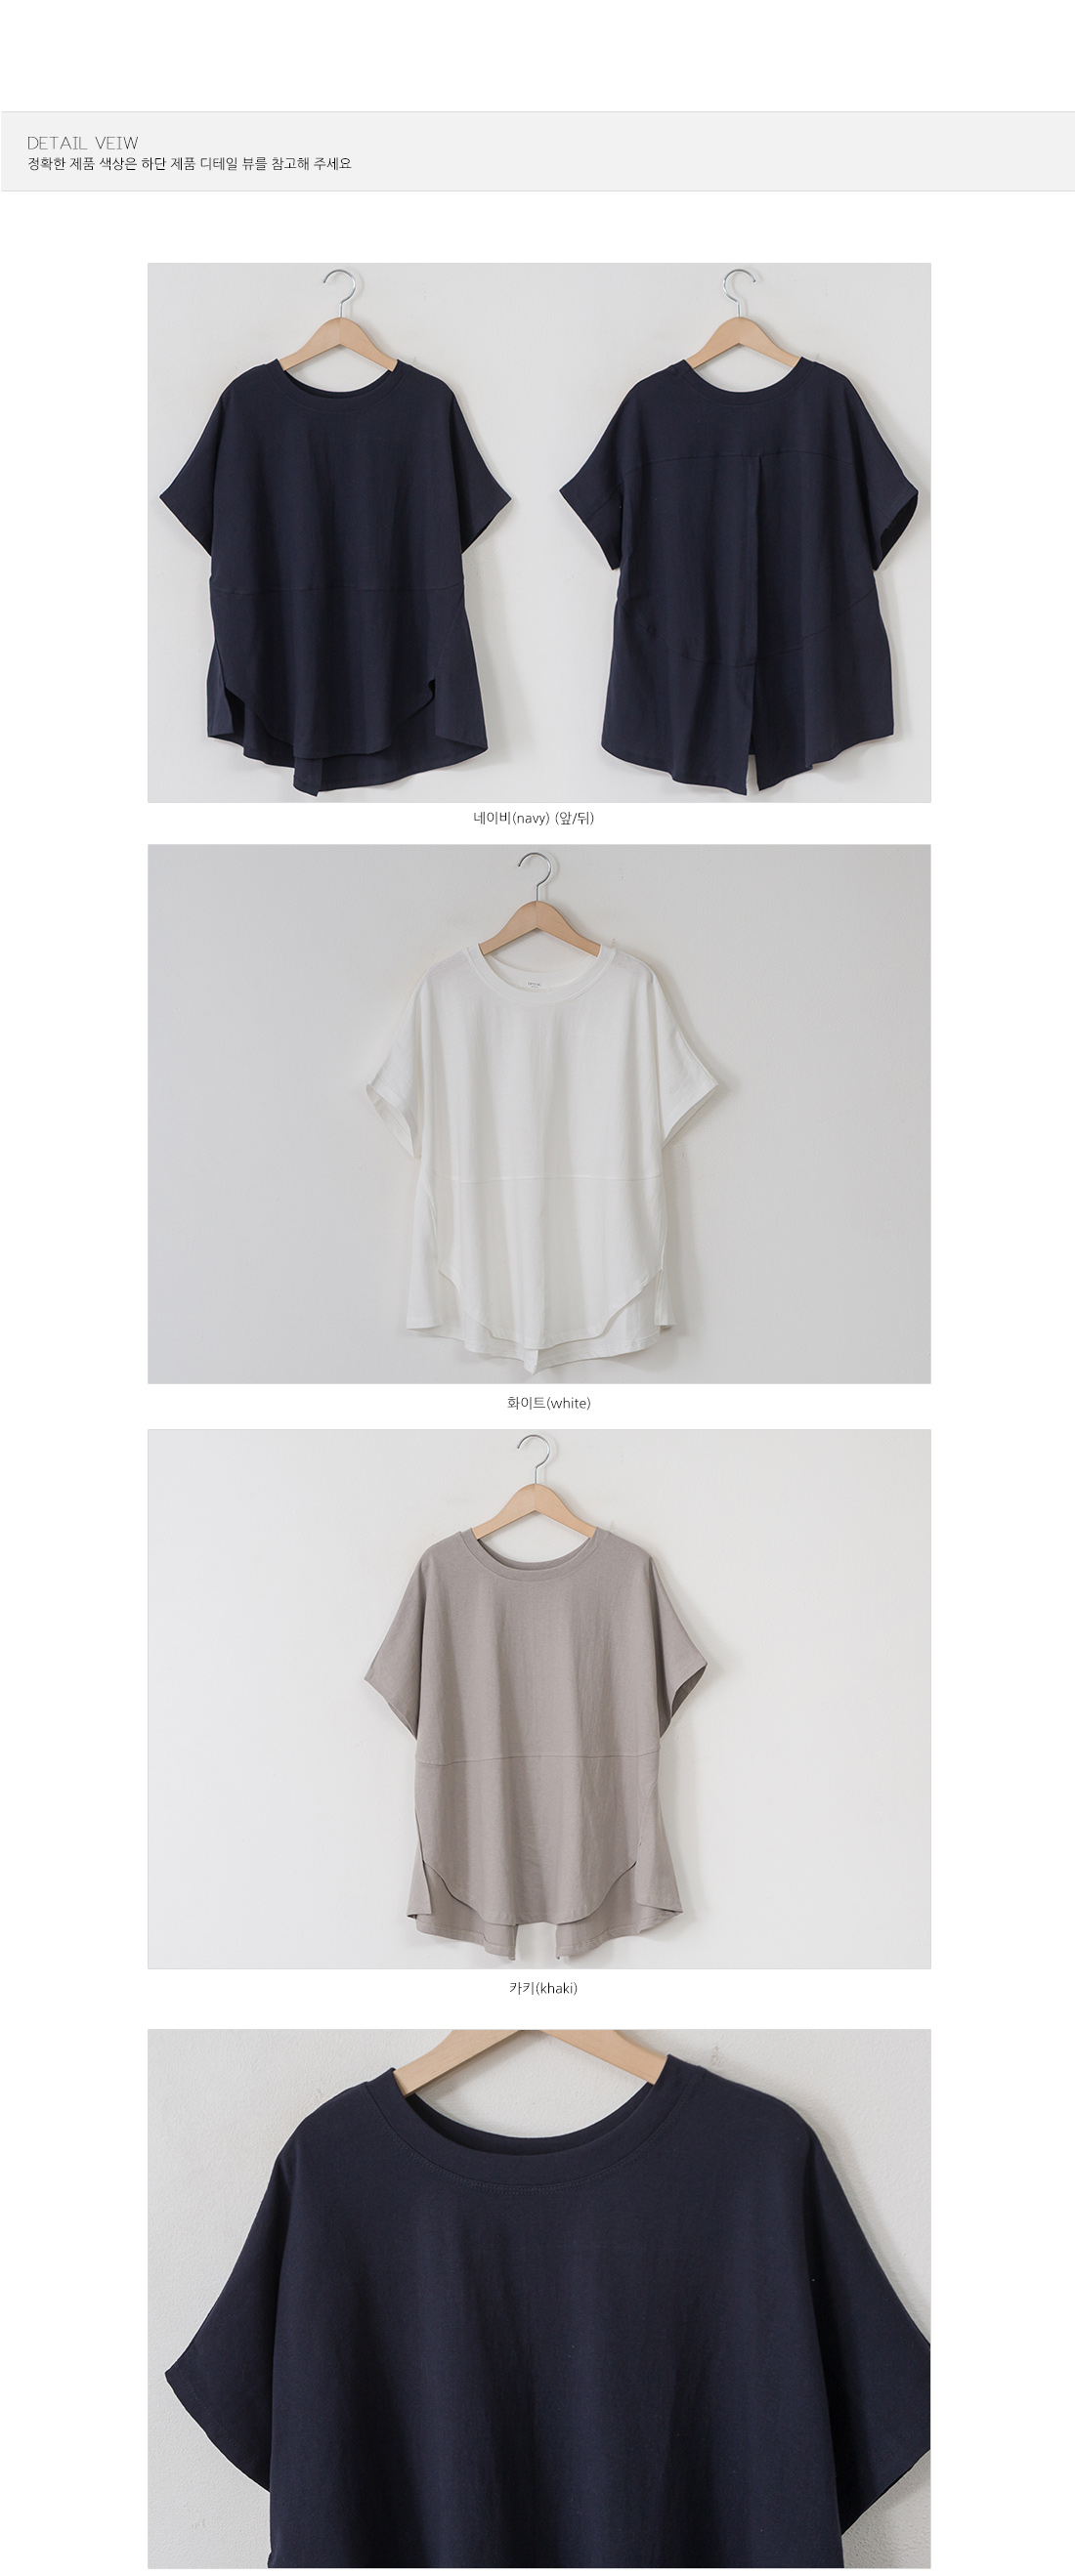 Unfoot cut loose fit T-shirt #106981